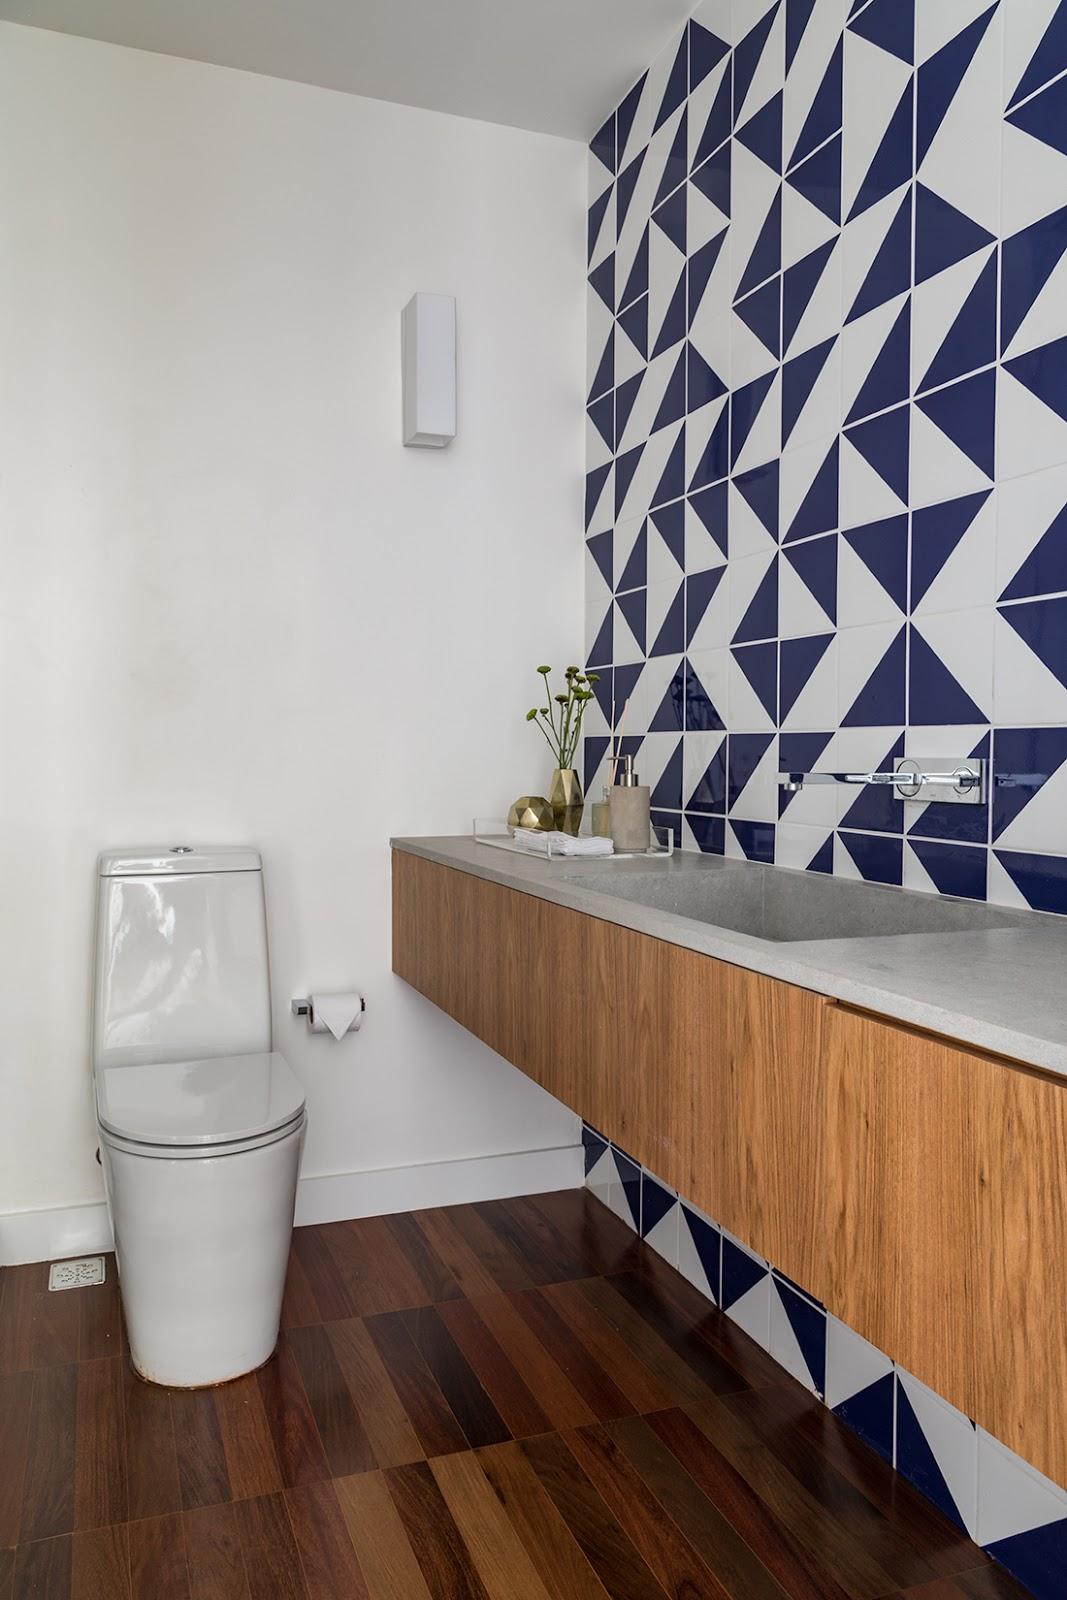 banheiro revestimento geométrico azul